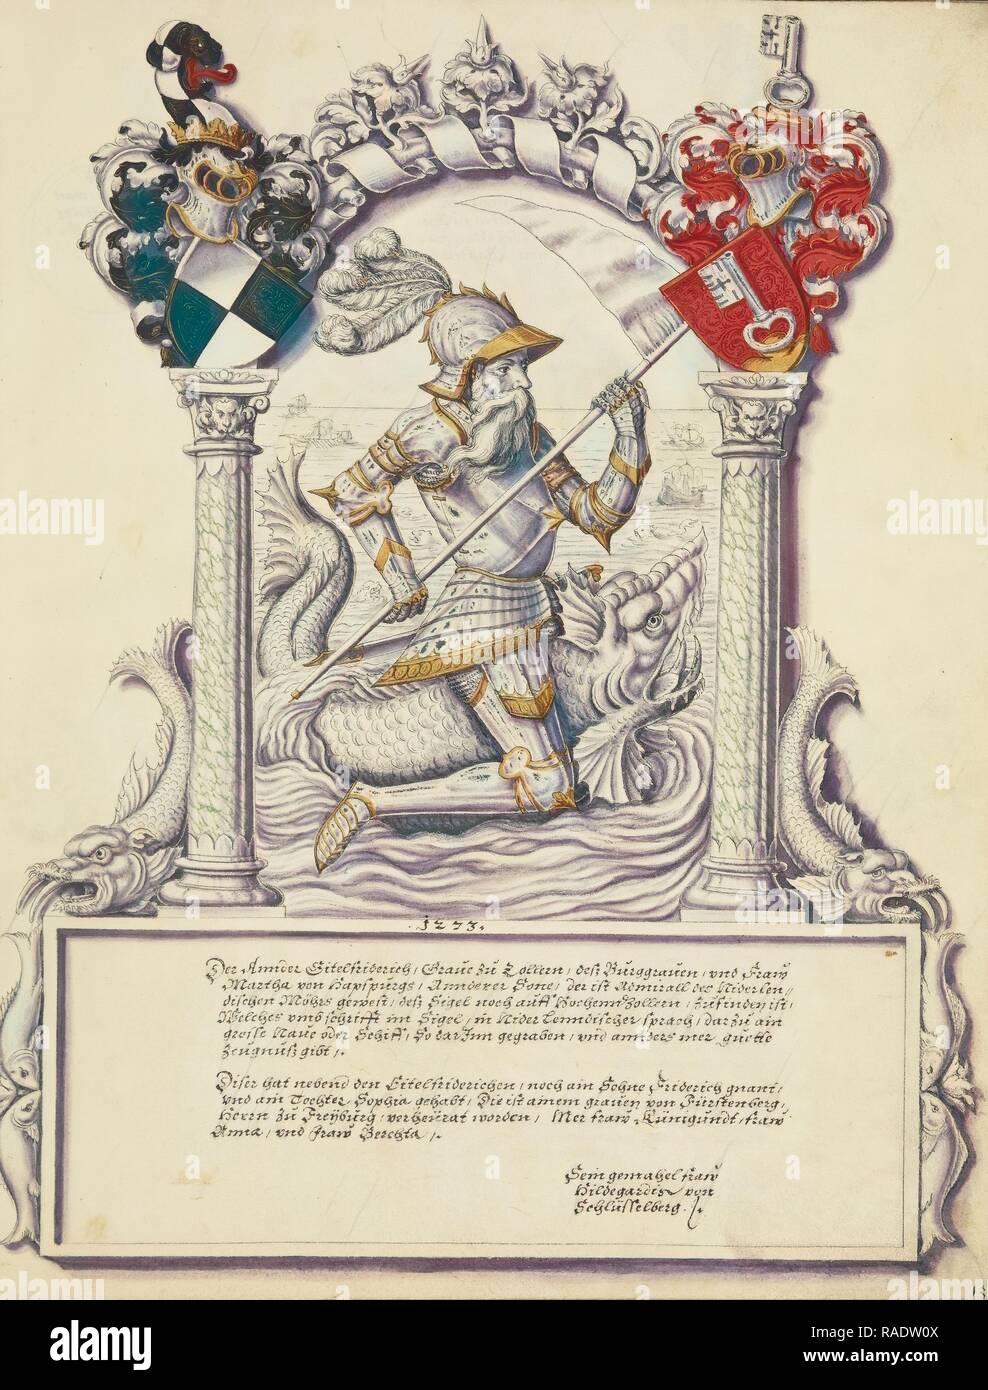 Eitelfriedrich II Hohenzollern, Jörg Ziegler (German, early 16th century - 1574,1577), Rottenburg, Germany, about reimagined - Stock Image